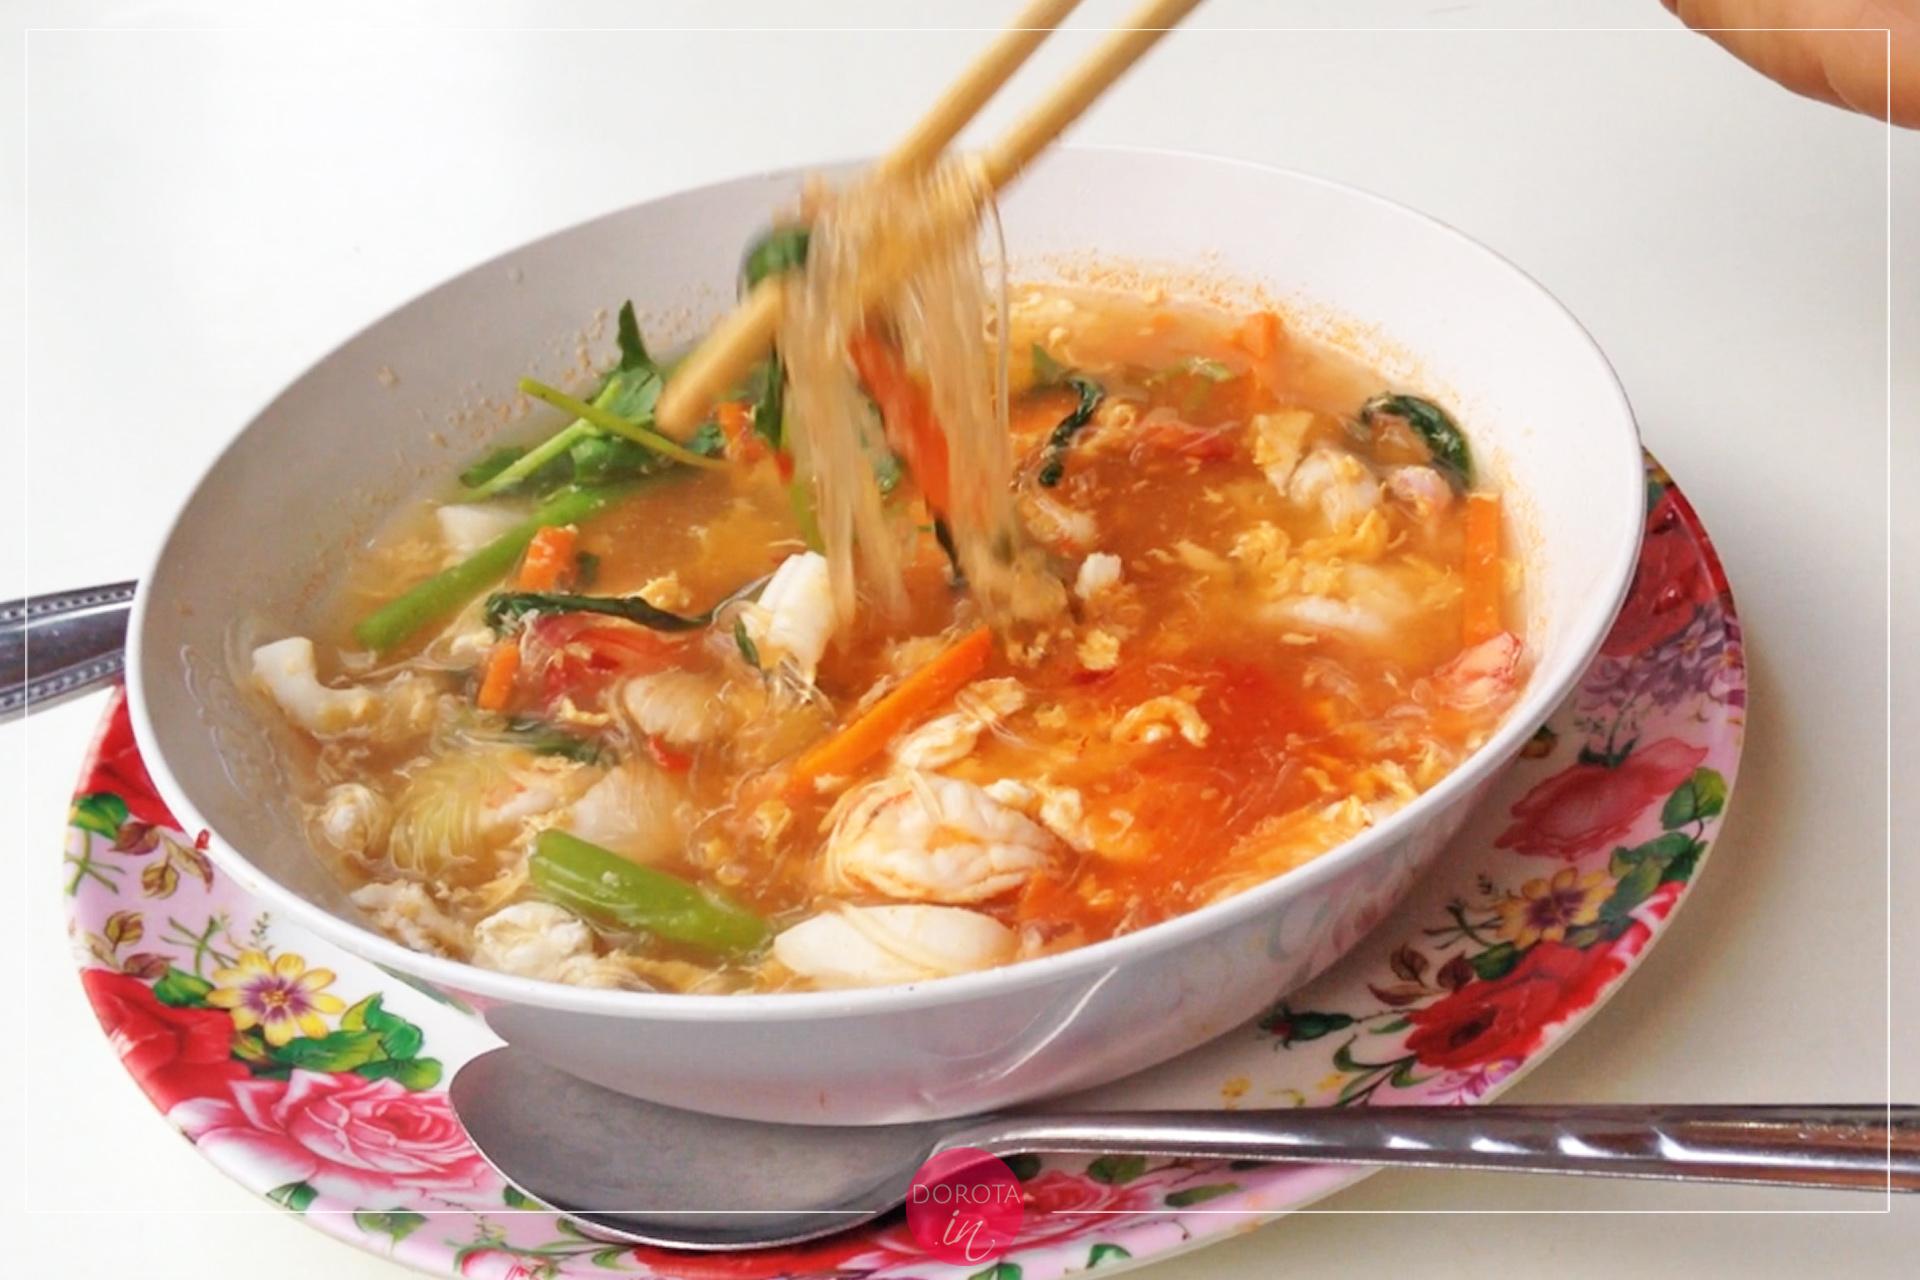 Suryaki z krewetkami i makaronem